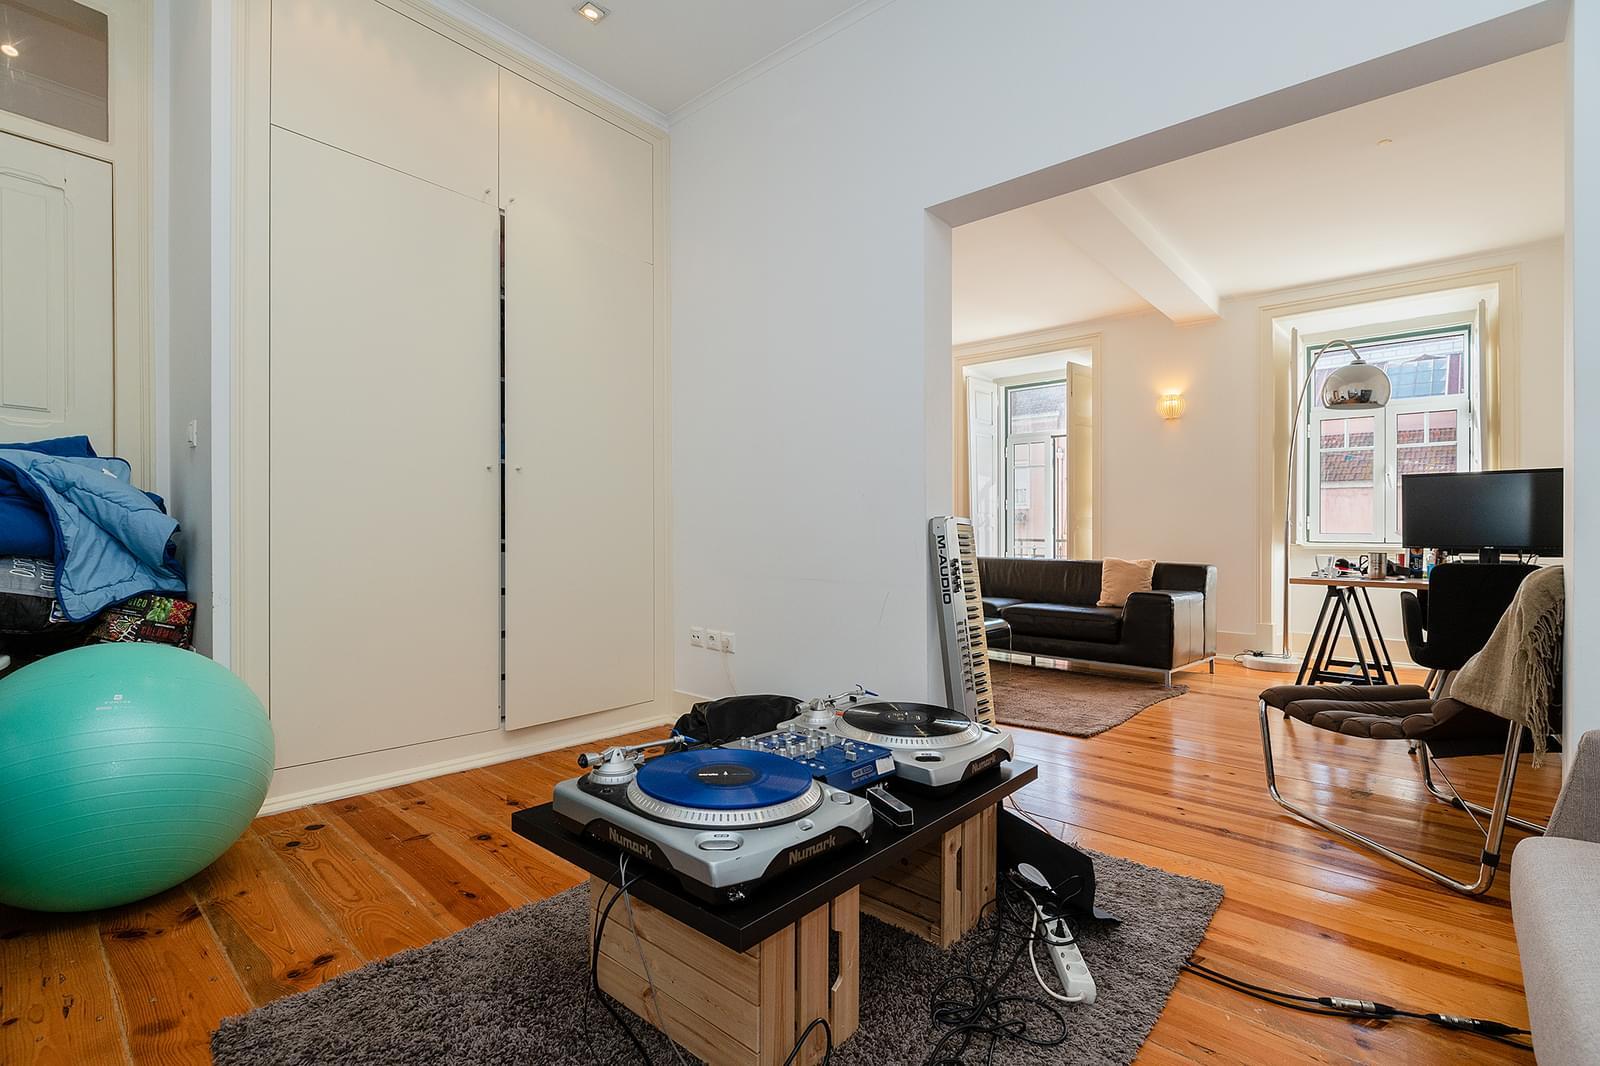 pf18211-apartamento-t2-1-lisboa-5fe75424-8ed6-4cfc-b51a-bf5641df01f8